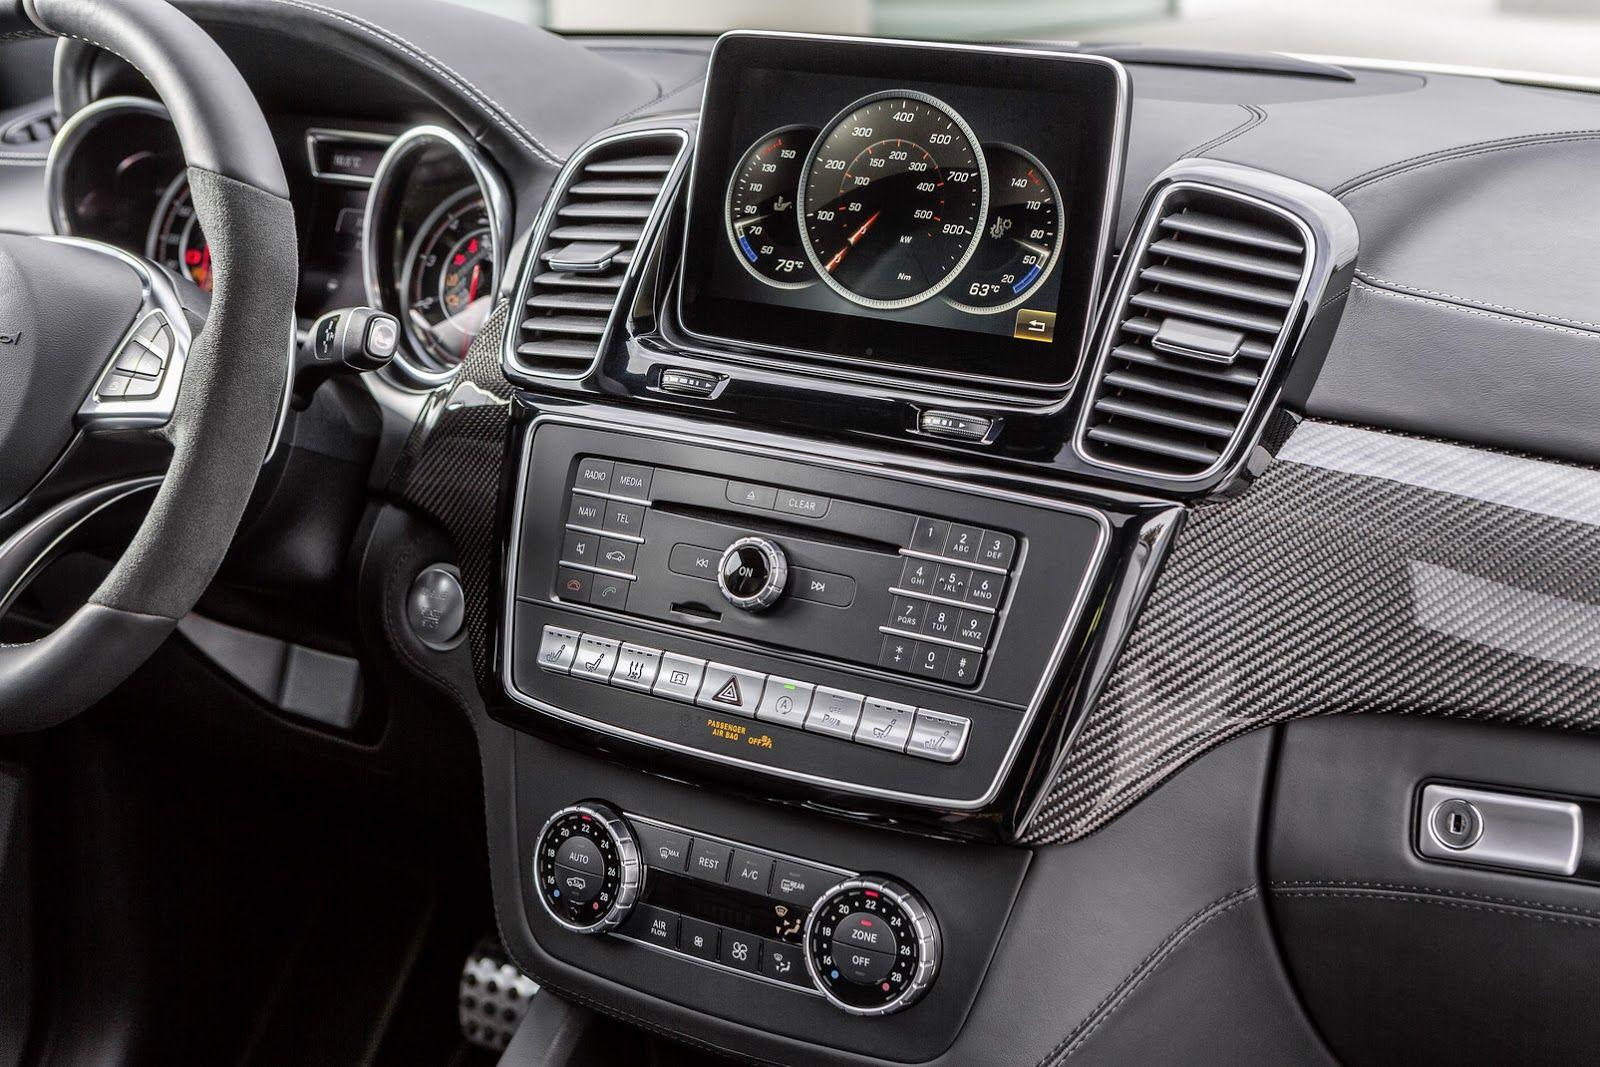 mercedes benz new car release2018 MercedesBenz GLE Review  2018 CARS RELEASE 2019  MERCEDES